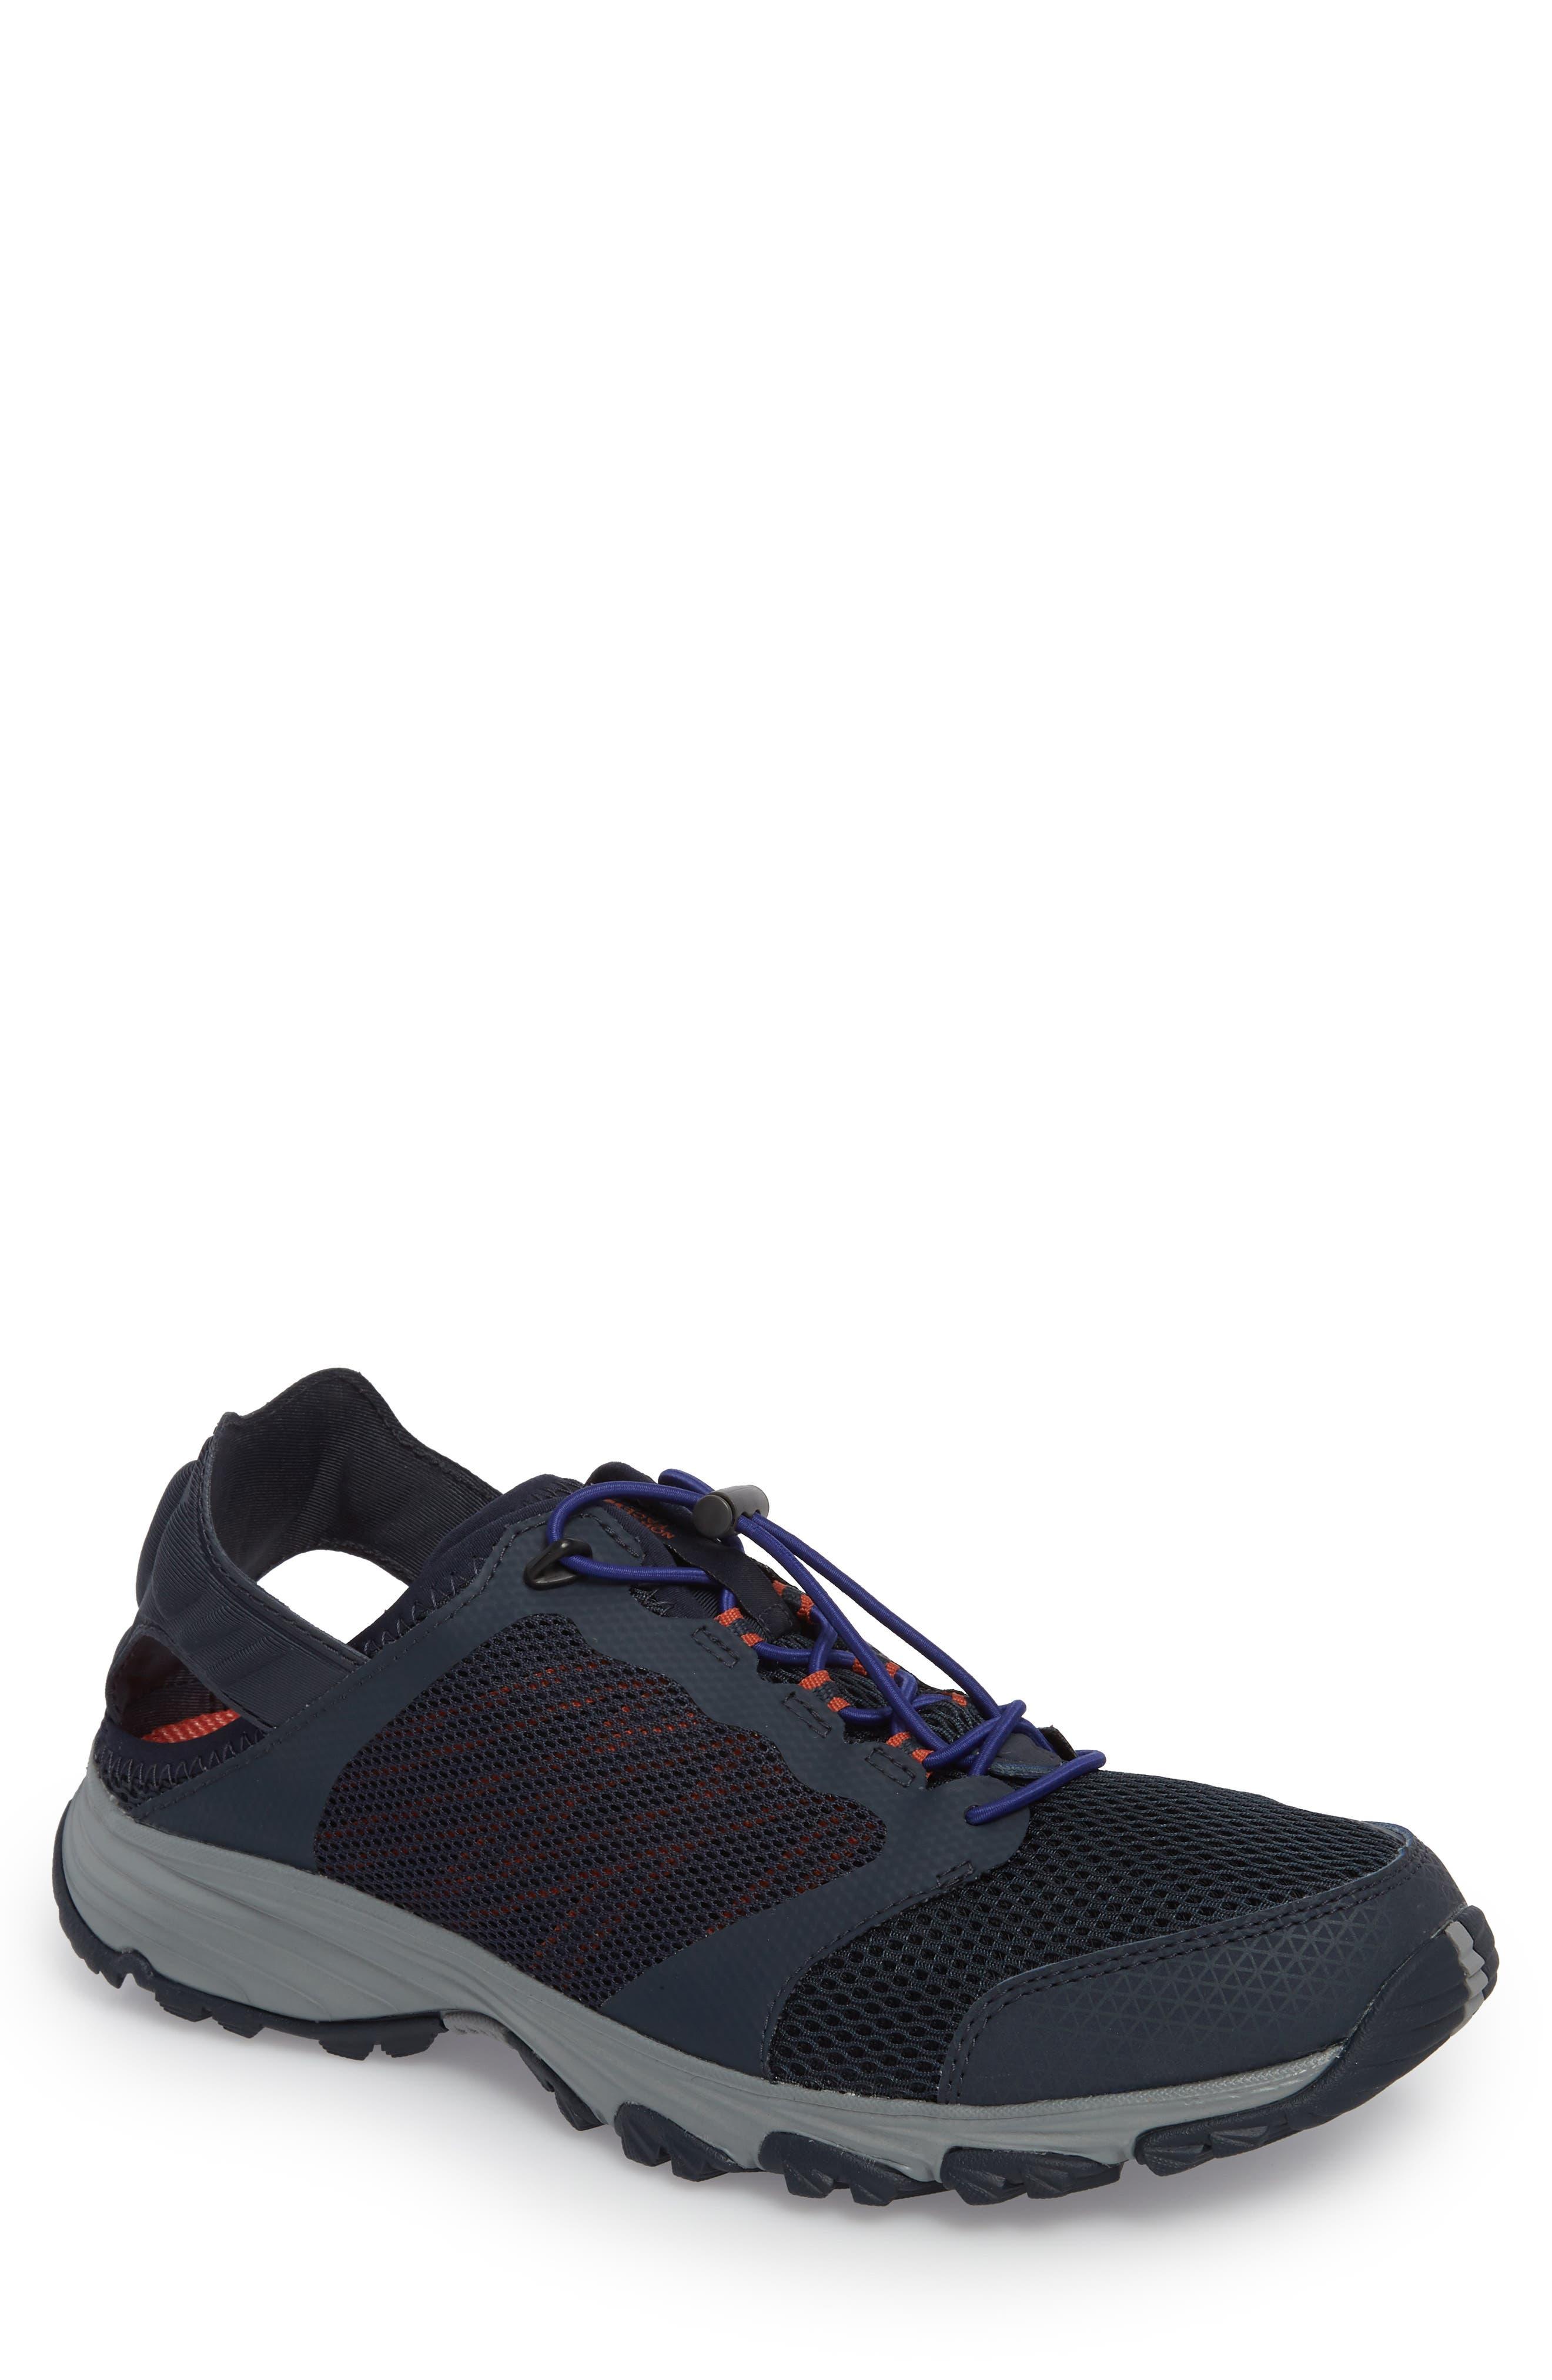 The North Face Litewave Amphibious II Collapsible Sneaker (Men)